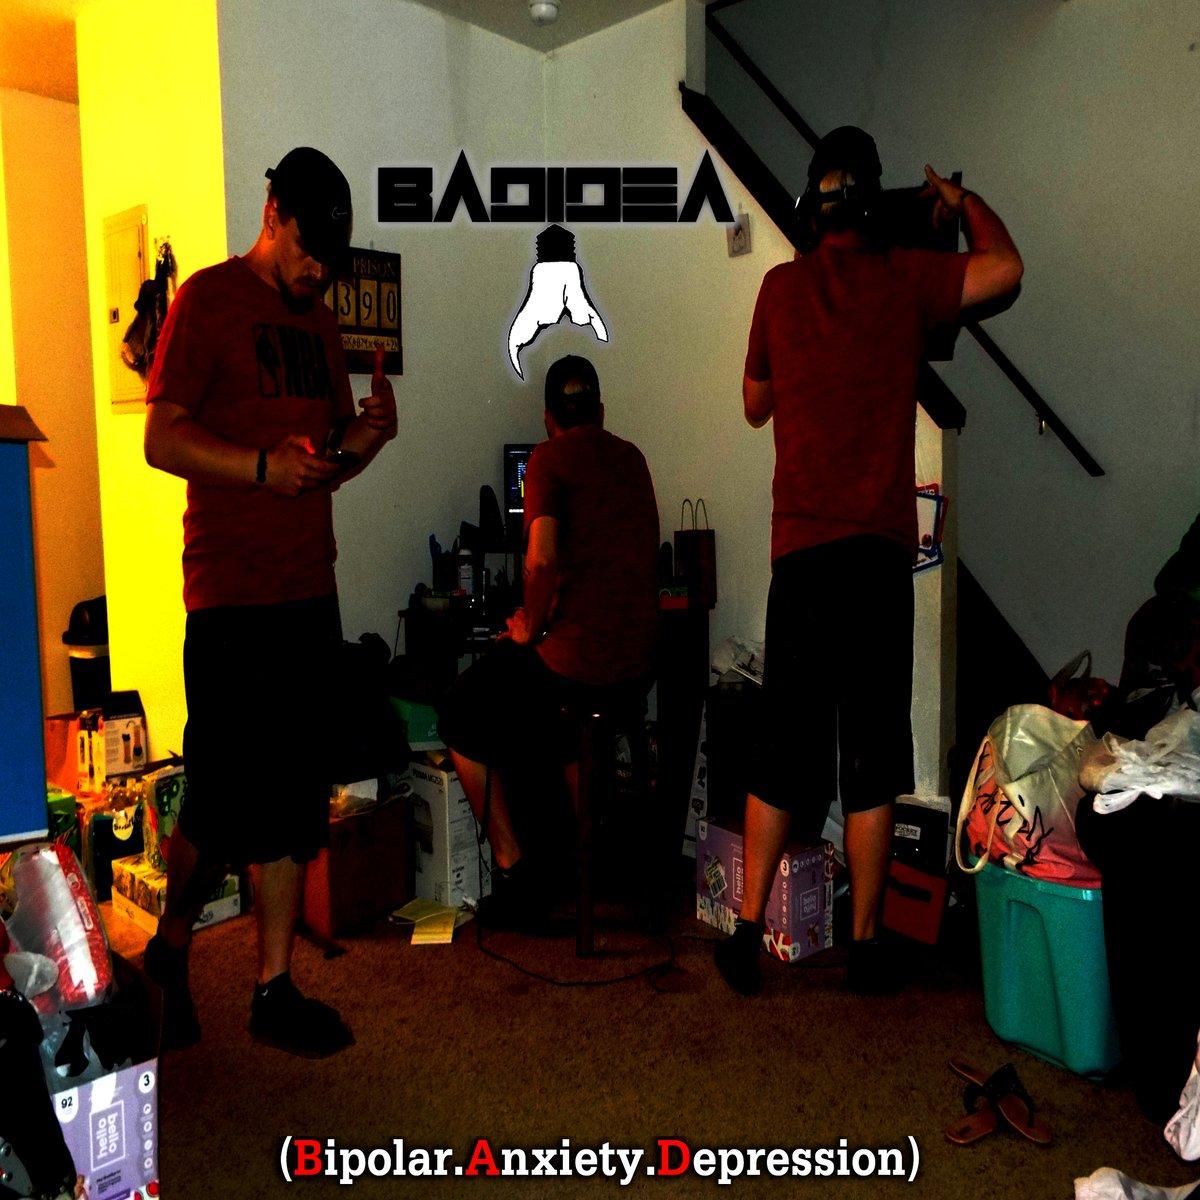 BadIdea - (Bipolar.Anxiety.Depression)